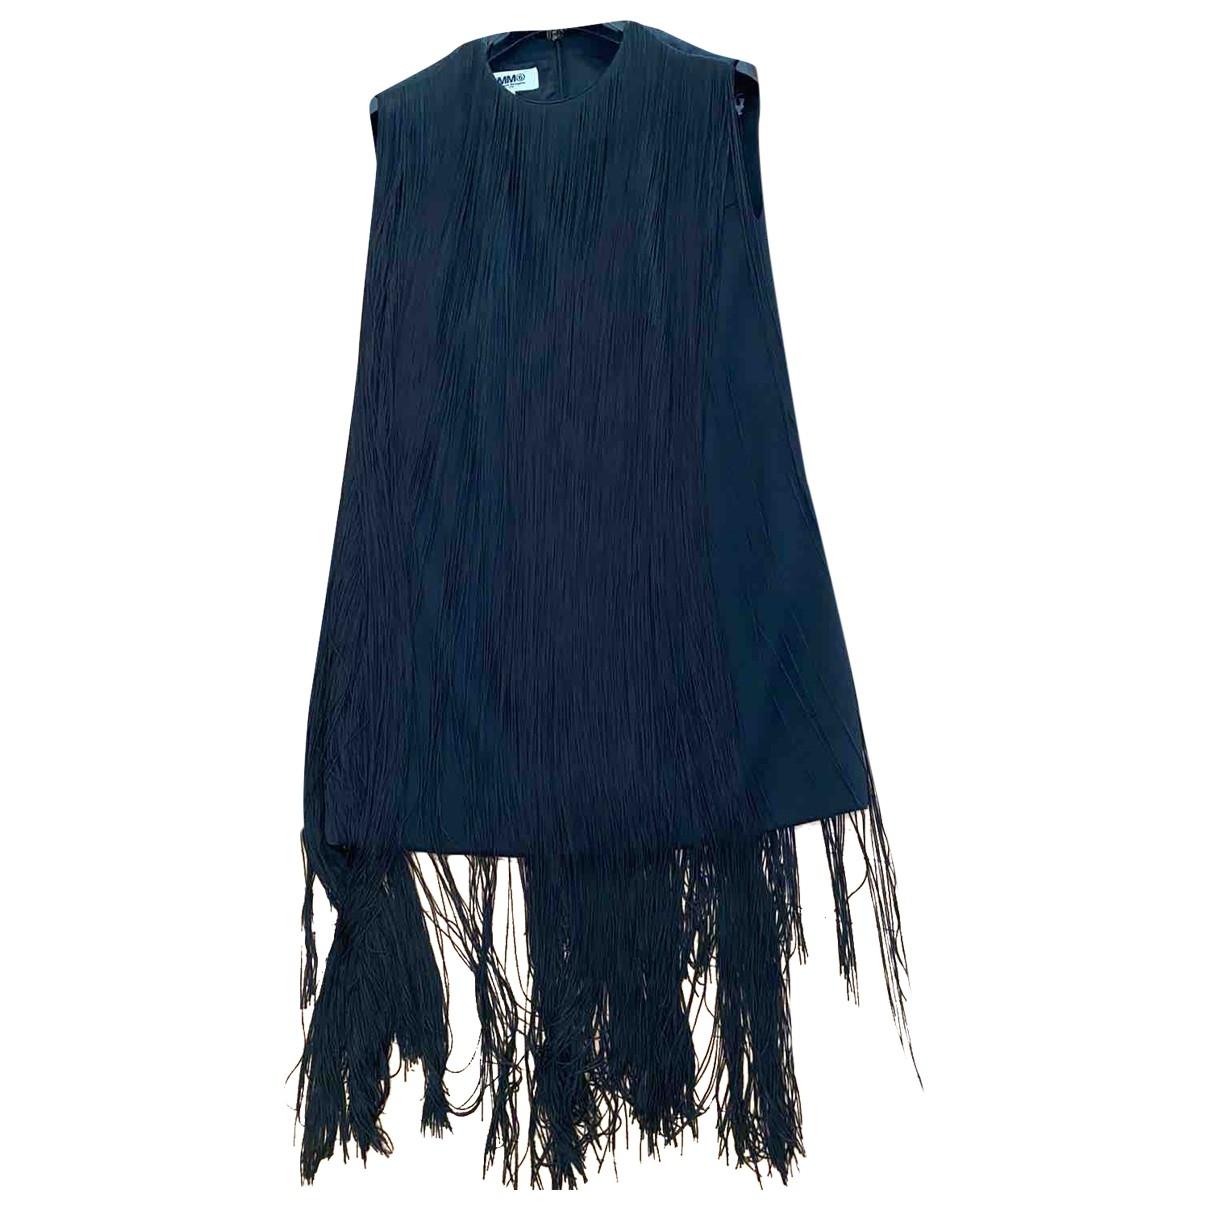 Mm6 \N Kleid in  Schwarz Wolle